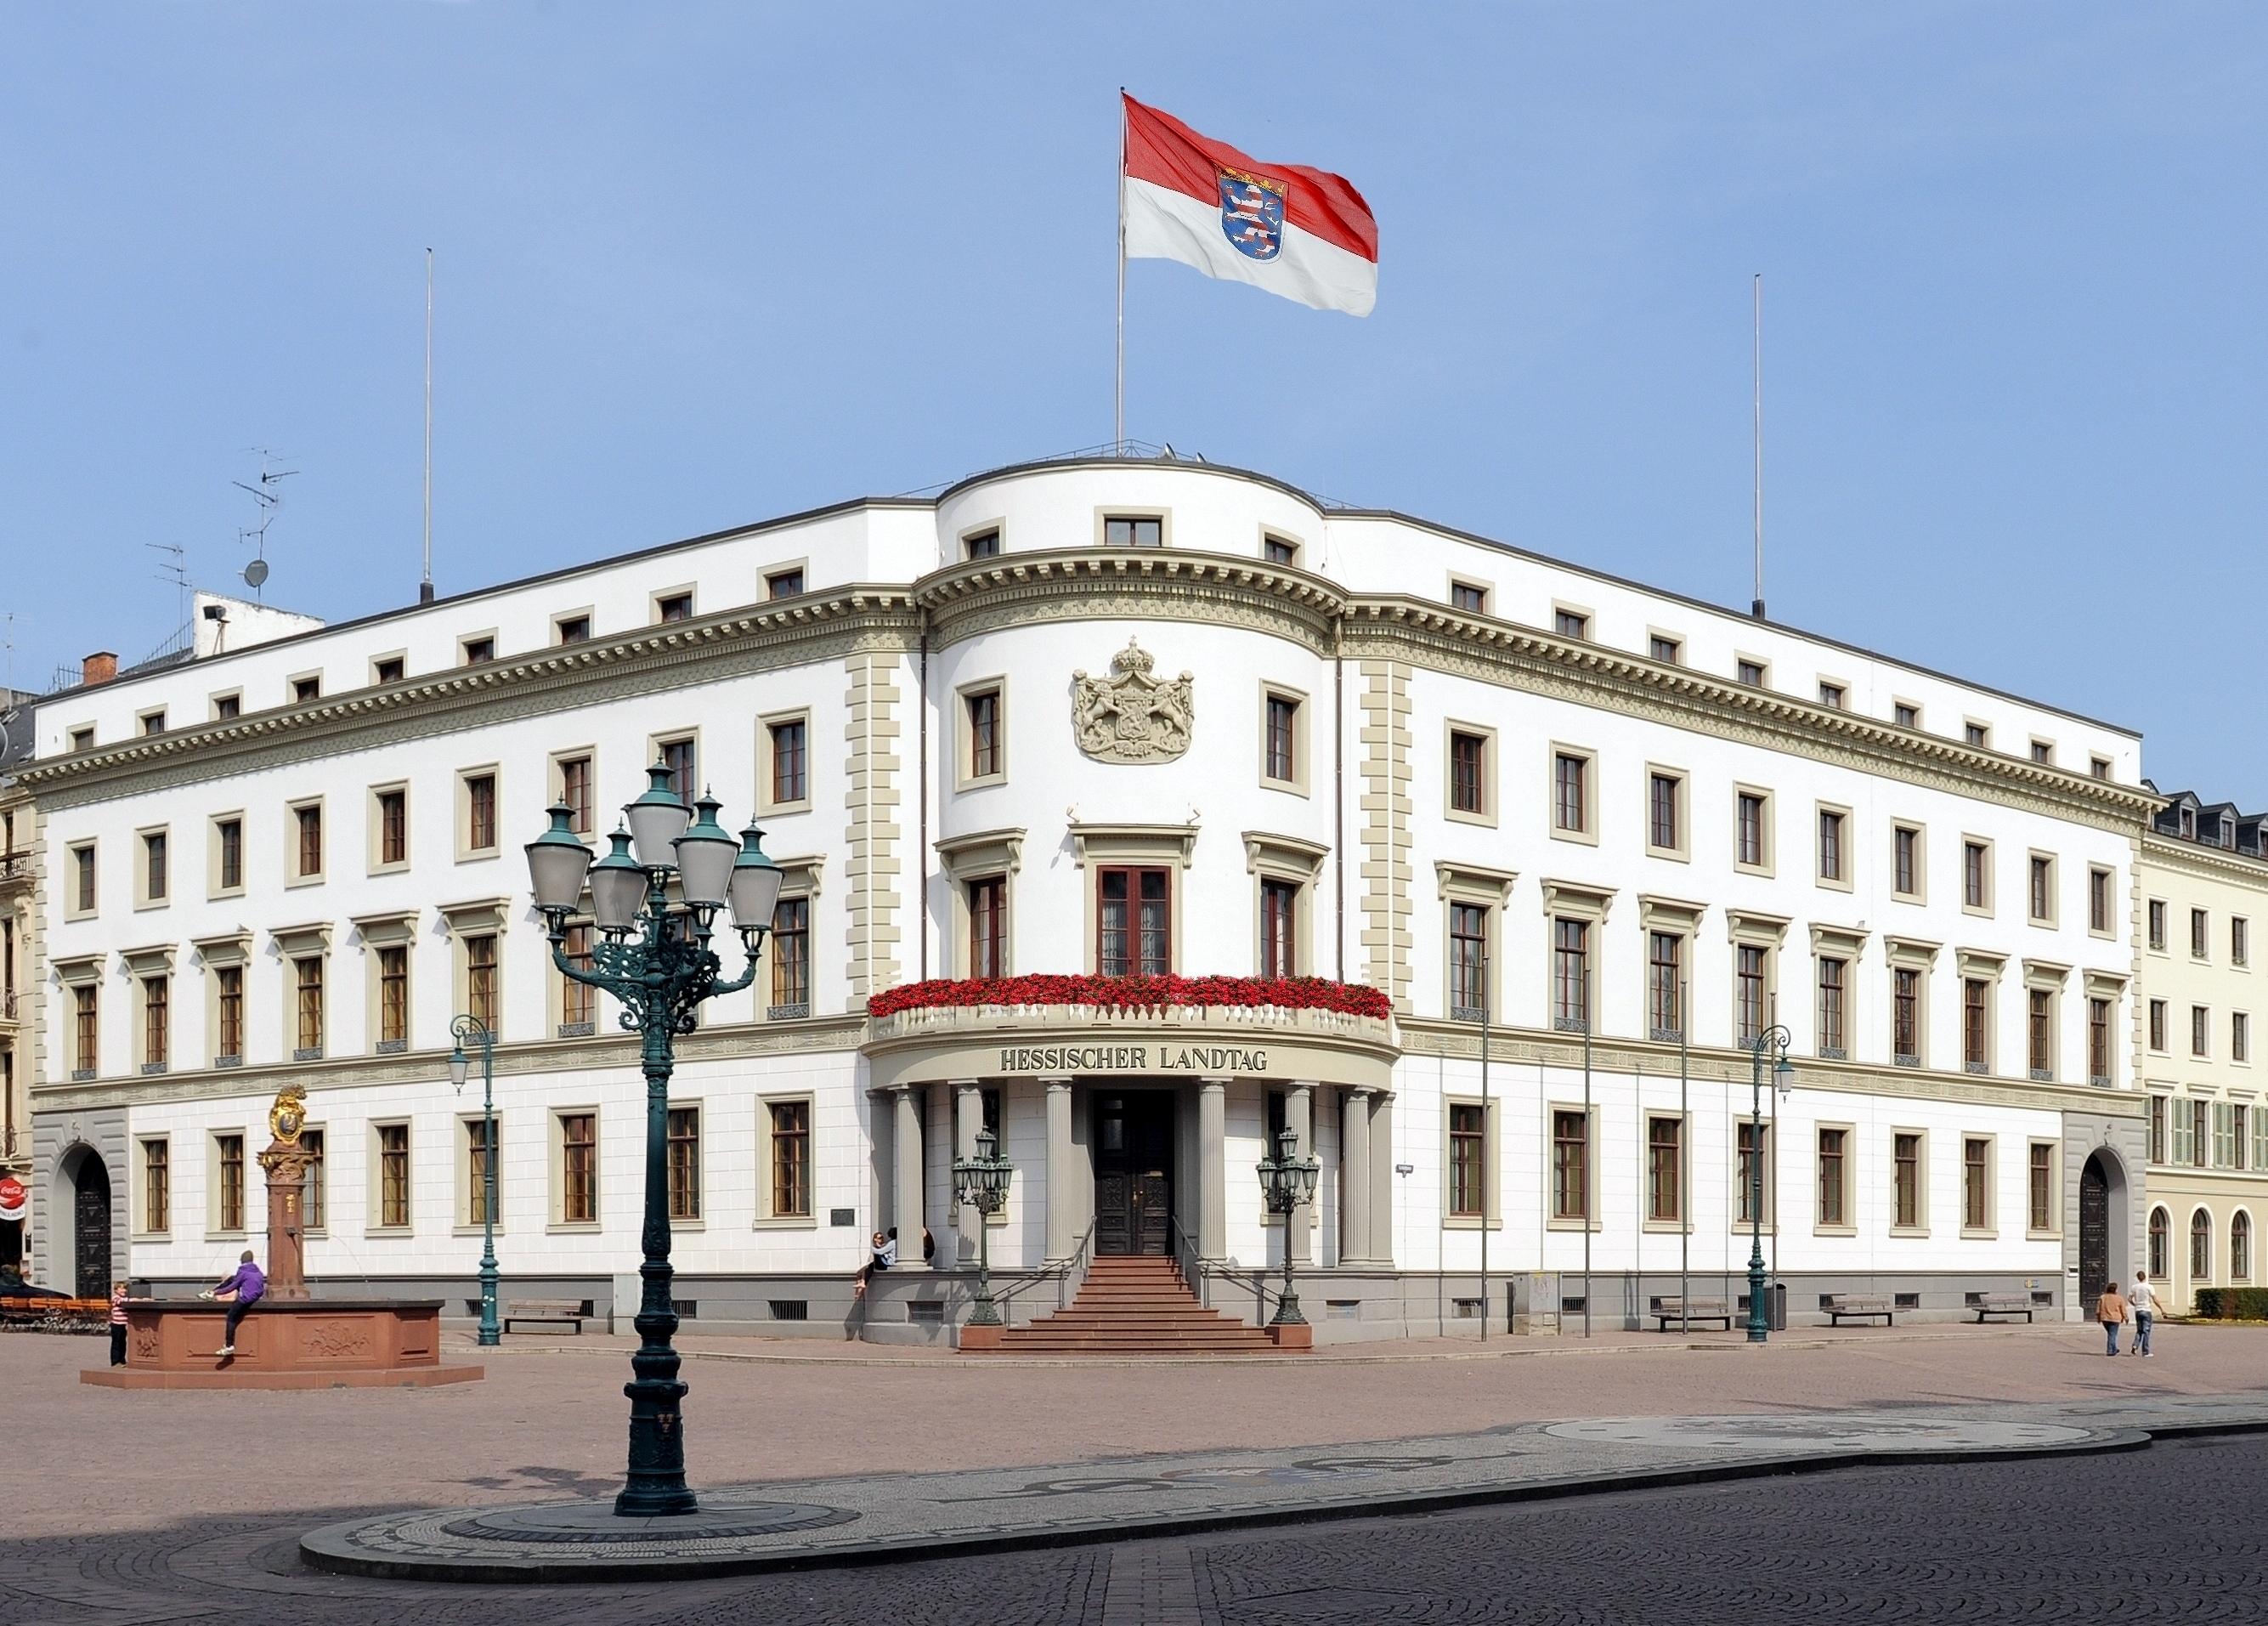 Das Wiesbadener Stadtschloss (Foto: Hessischer Landtag; H. Heibel)